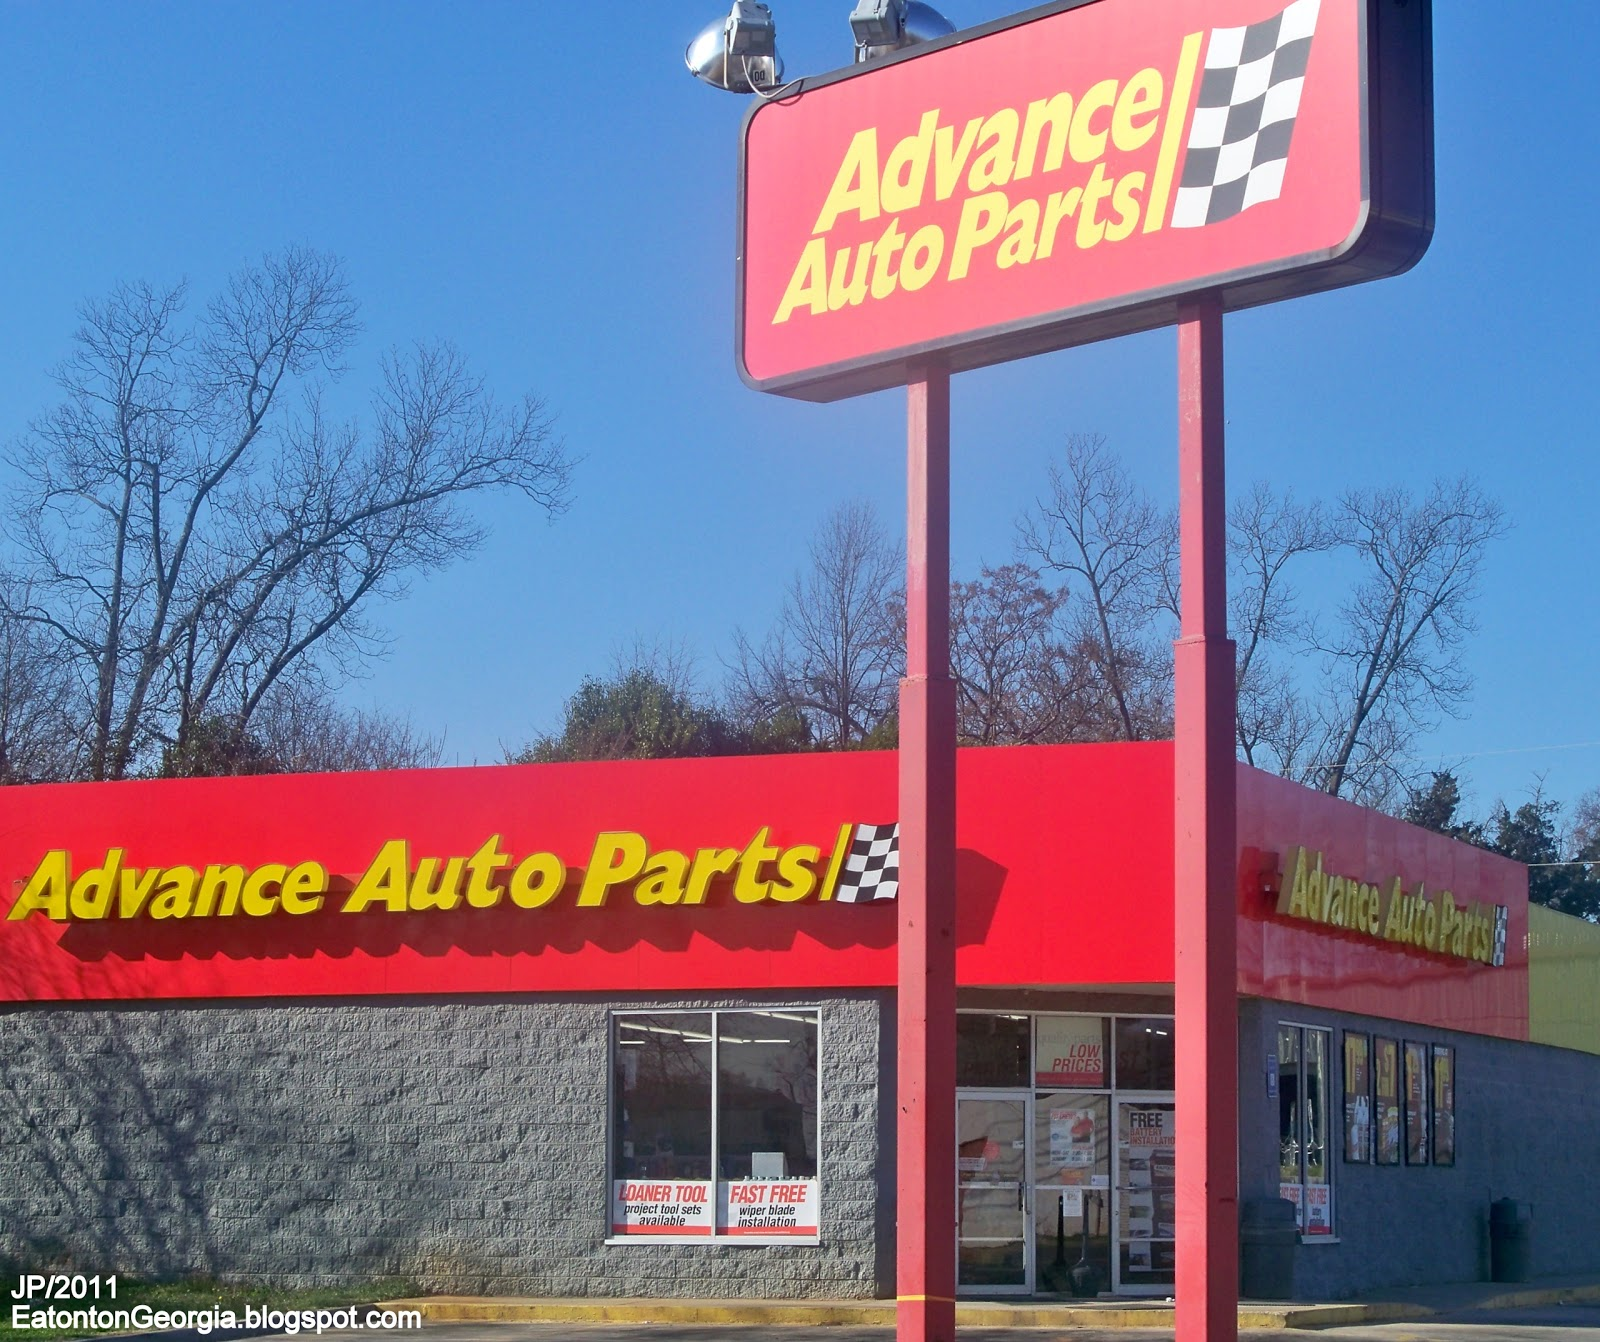 advance-auto-parts-eatonton-georgia-advance-auto-parts-store-eatonton-ga